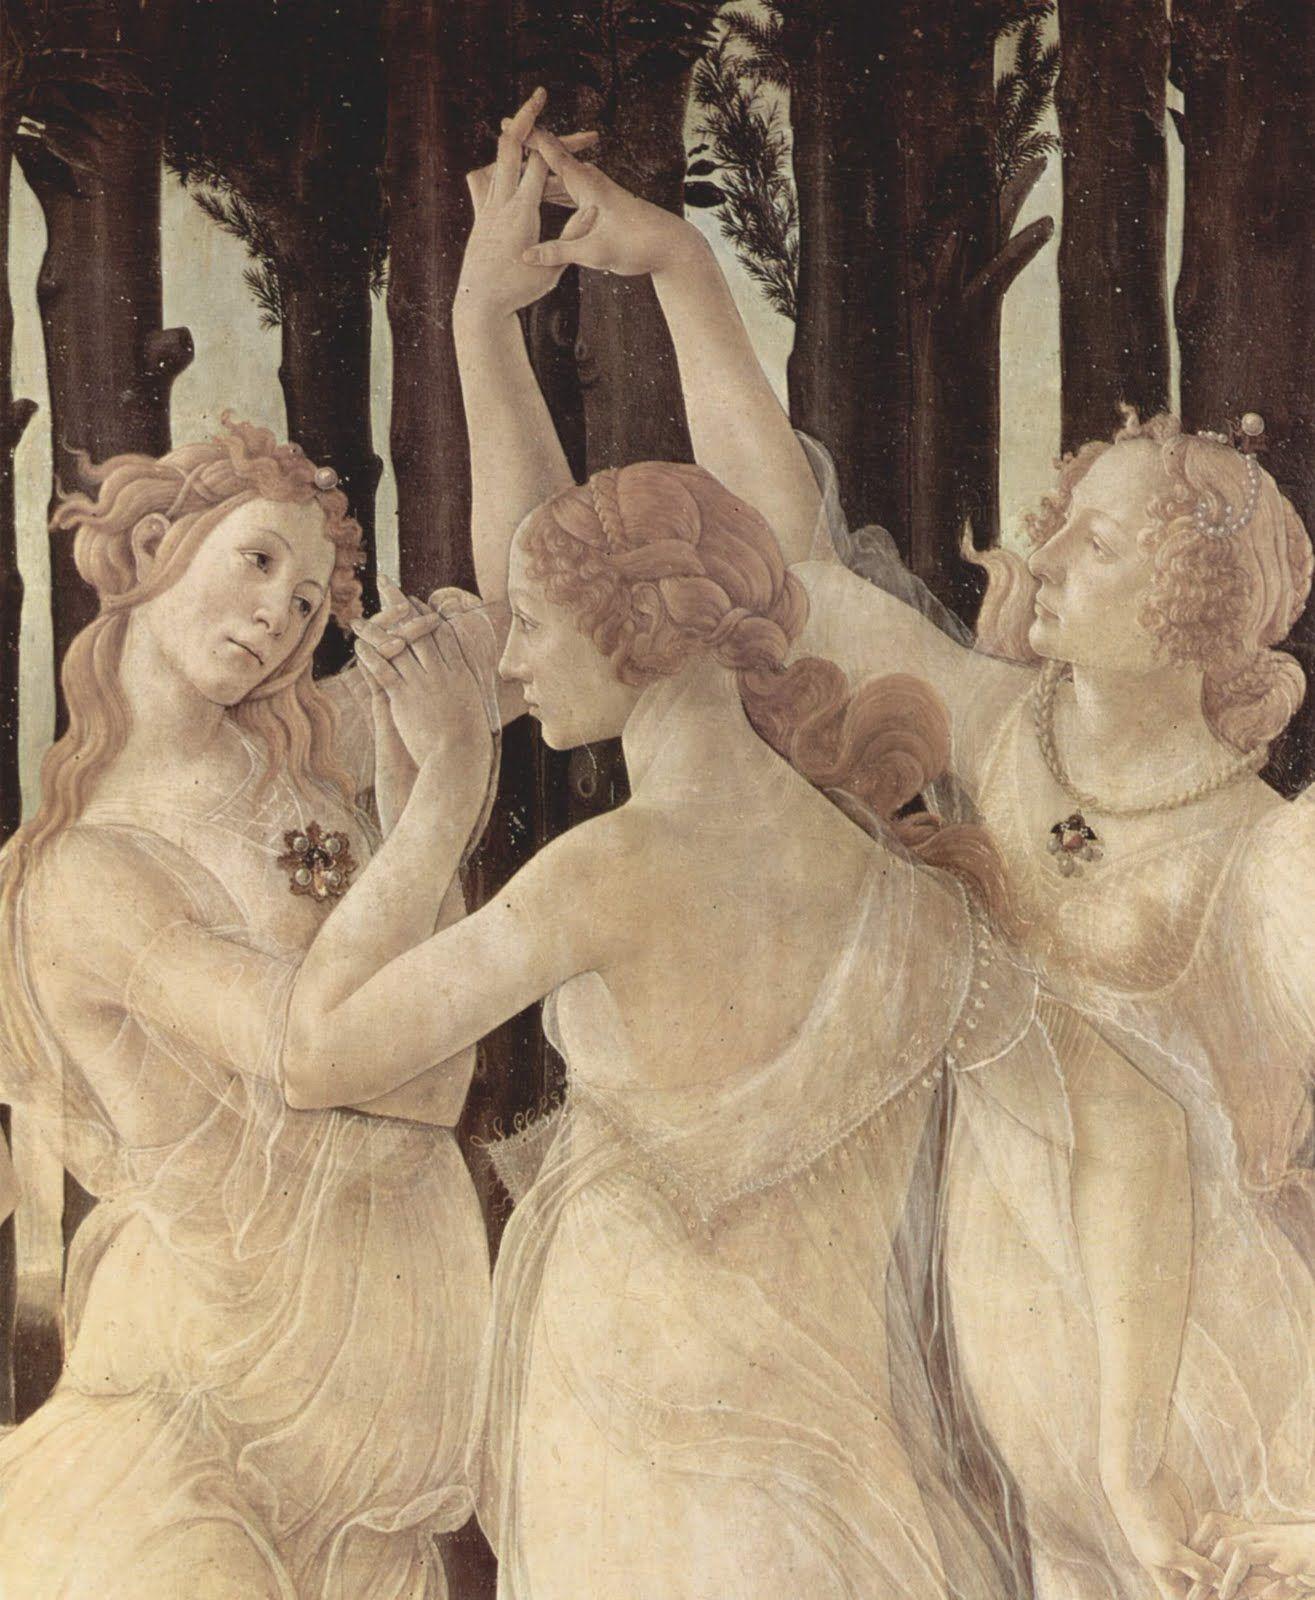 Detail of La Primavera, Sandro Botticelli.